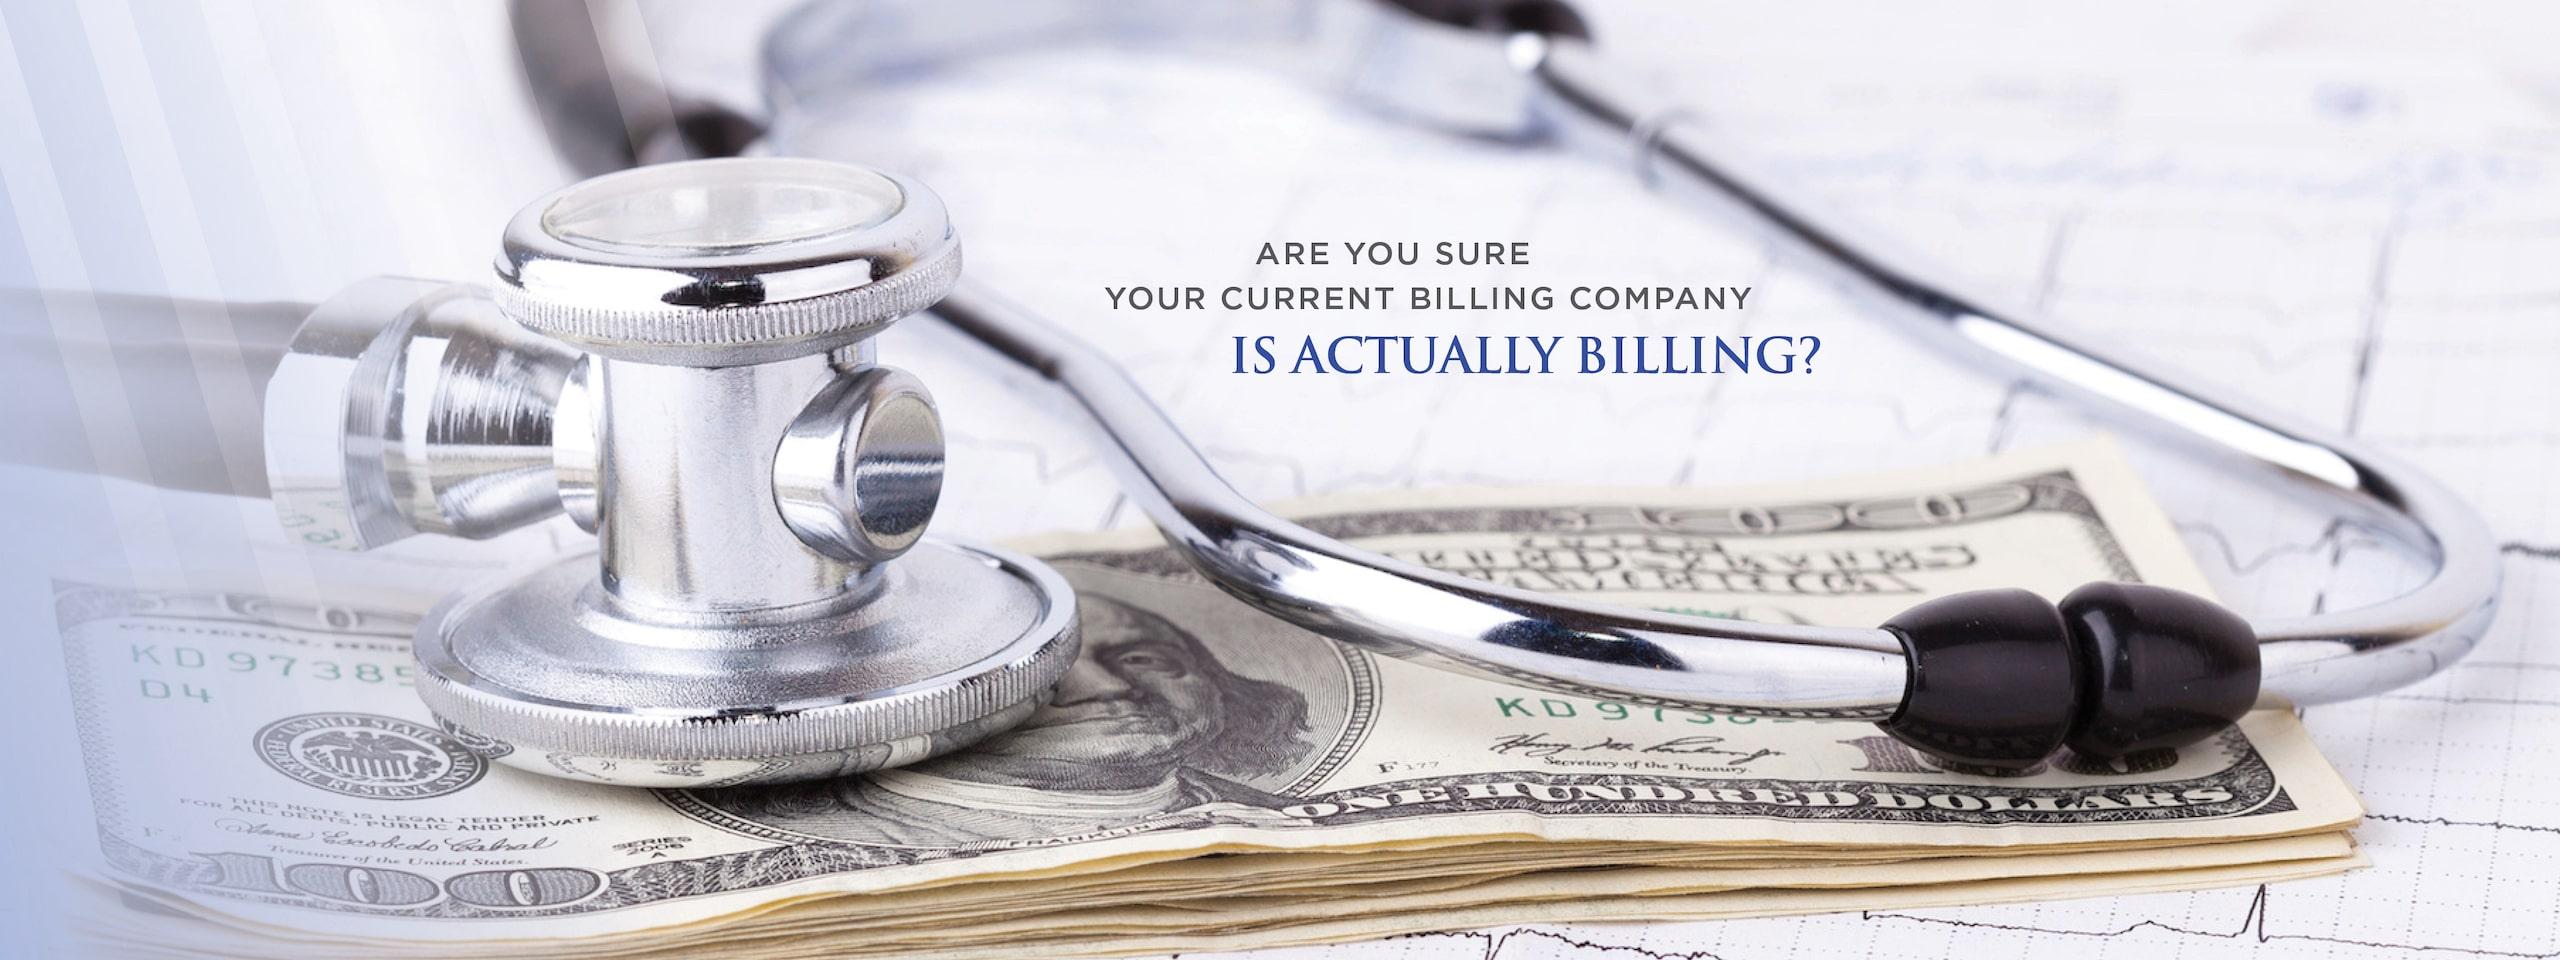 Precision Medical Billing Company Services Lexington KY